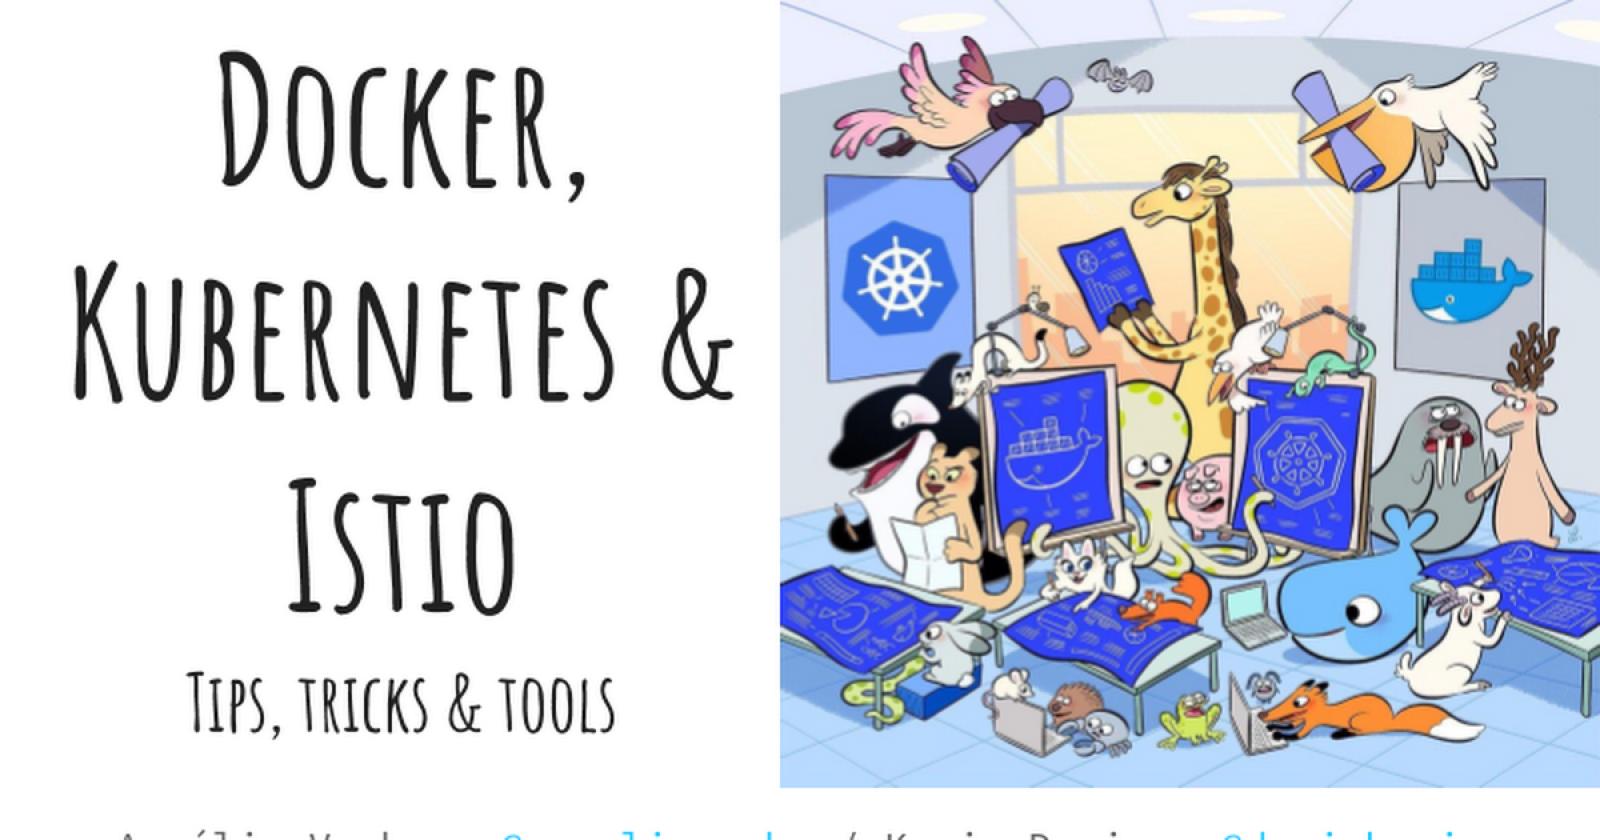 Docker, Kubernetes & Istio : Tips, tricks & tools